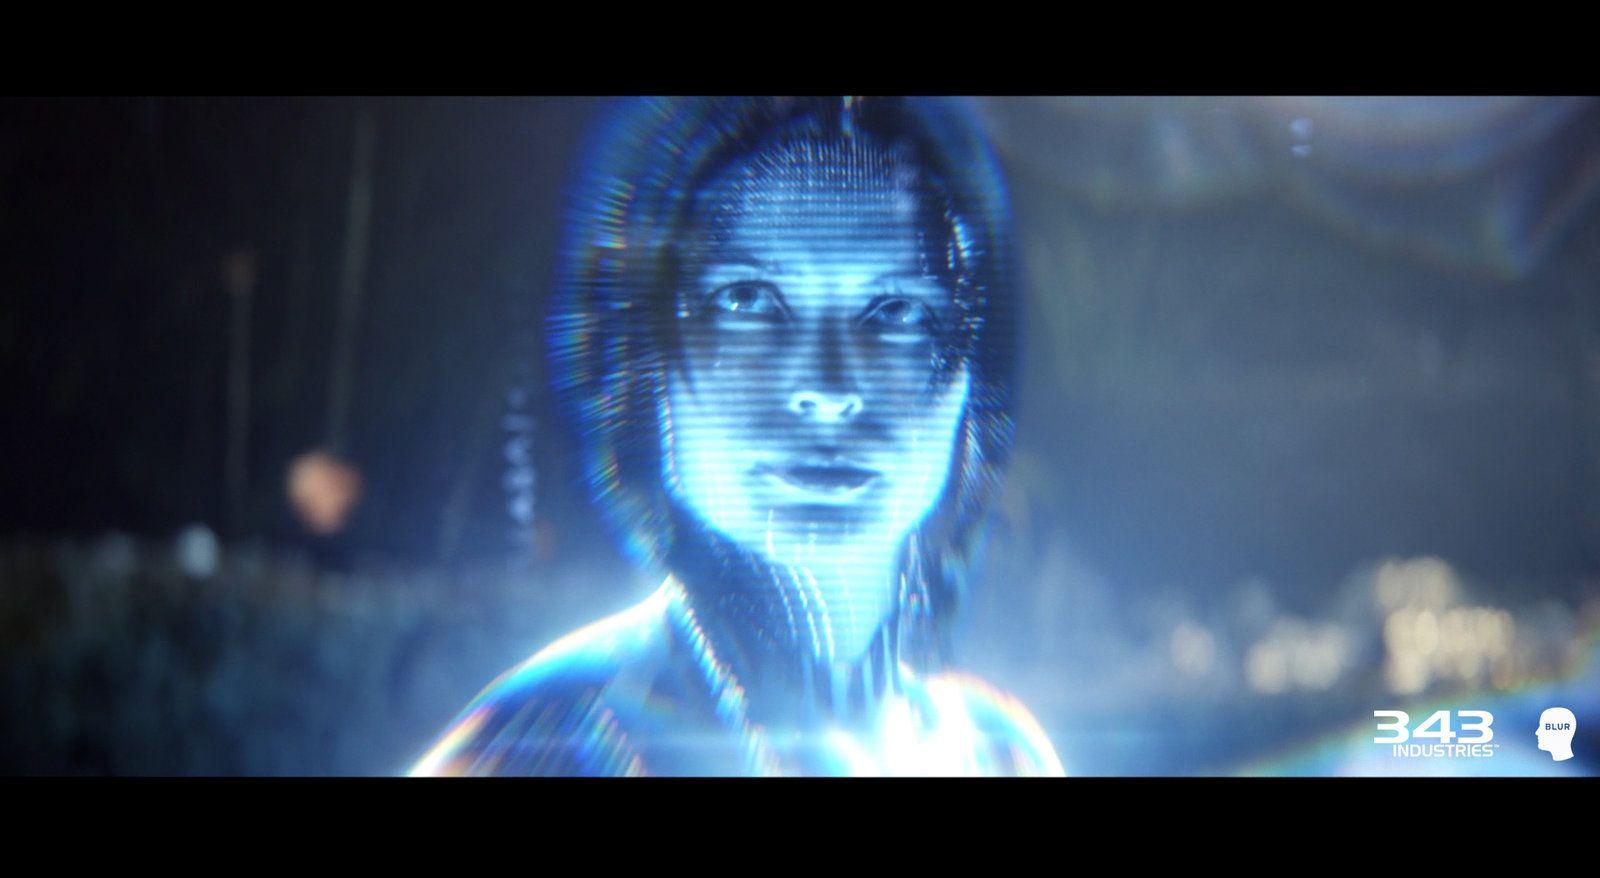 Pin By Ause On Digital Art Blur Studios Halo 2 Cortana Halo